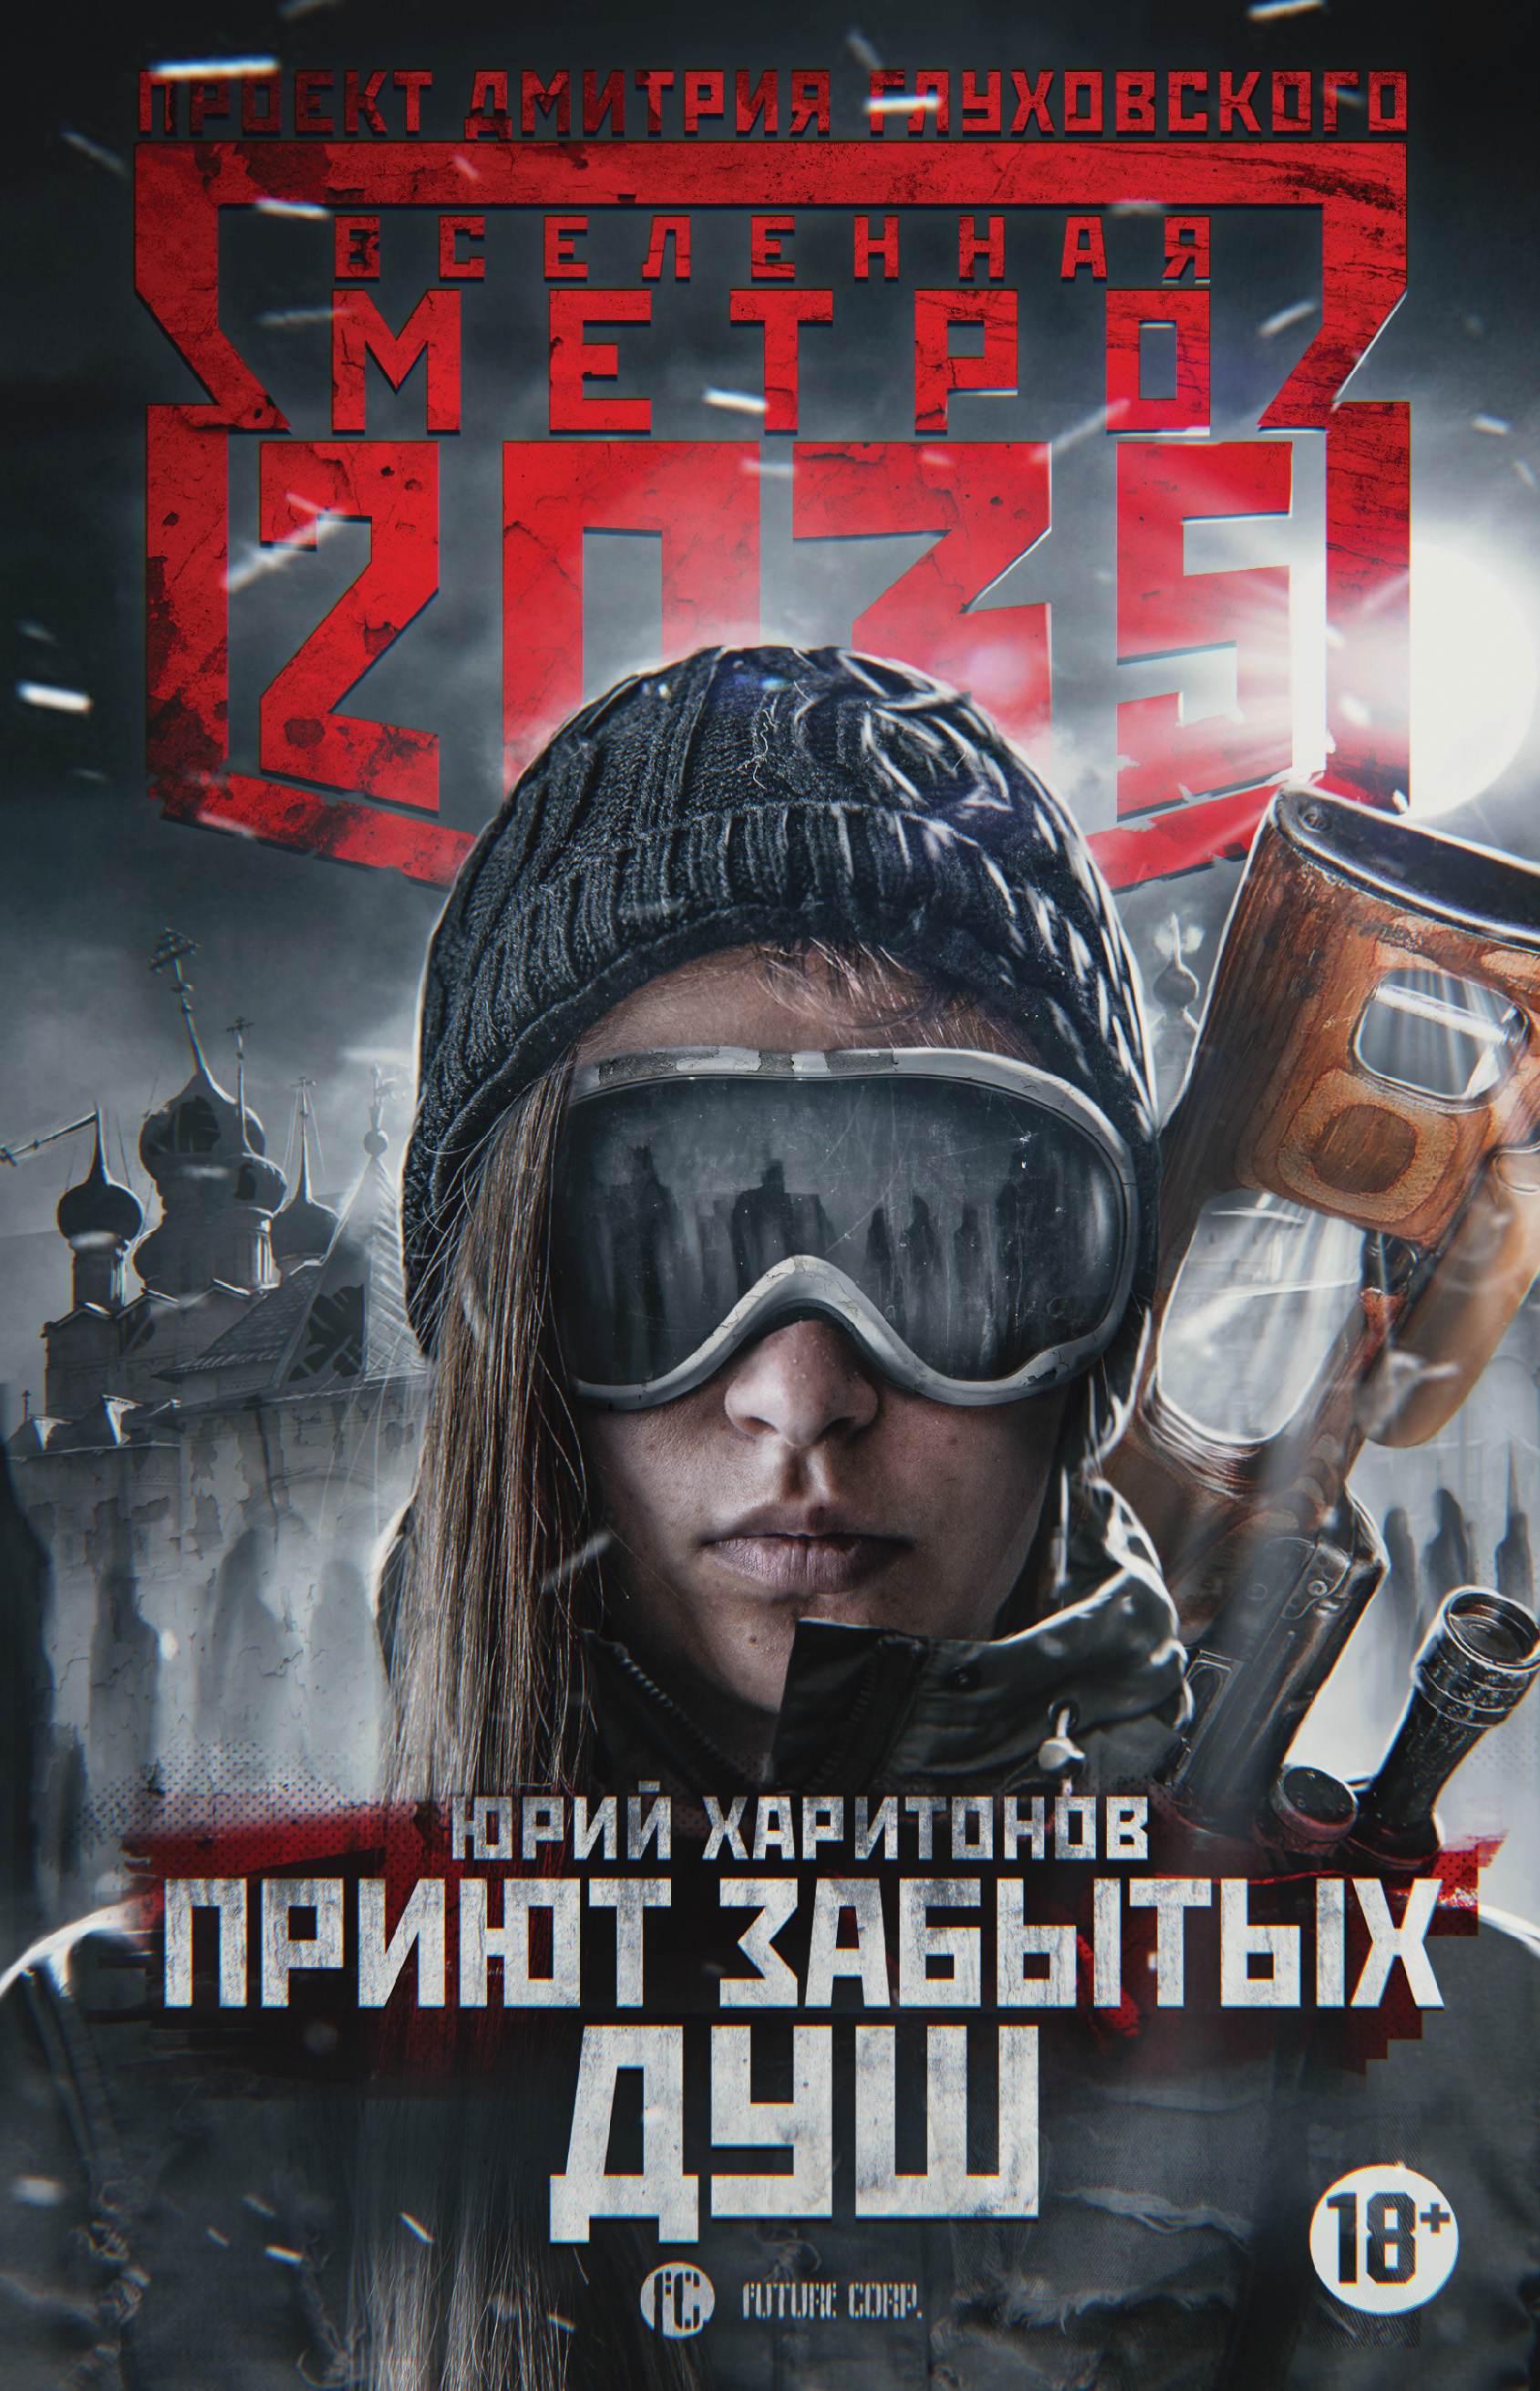 цена на Юрий Харитонов Метро 2035: Приют забытых душ